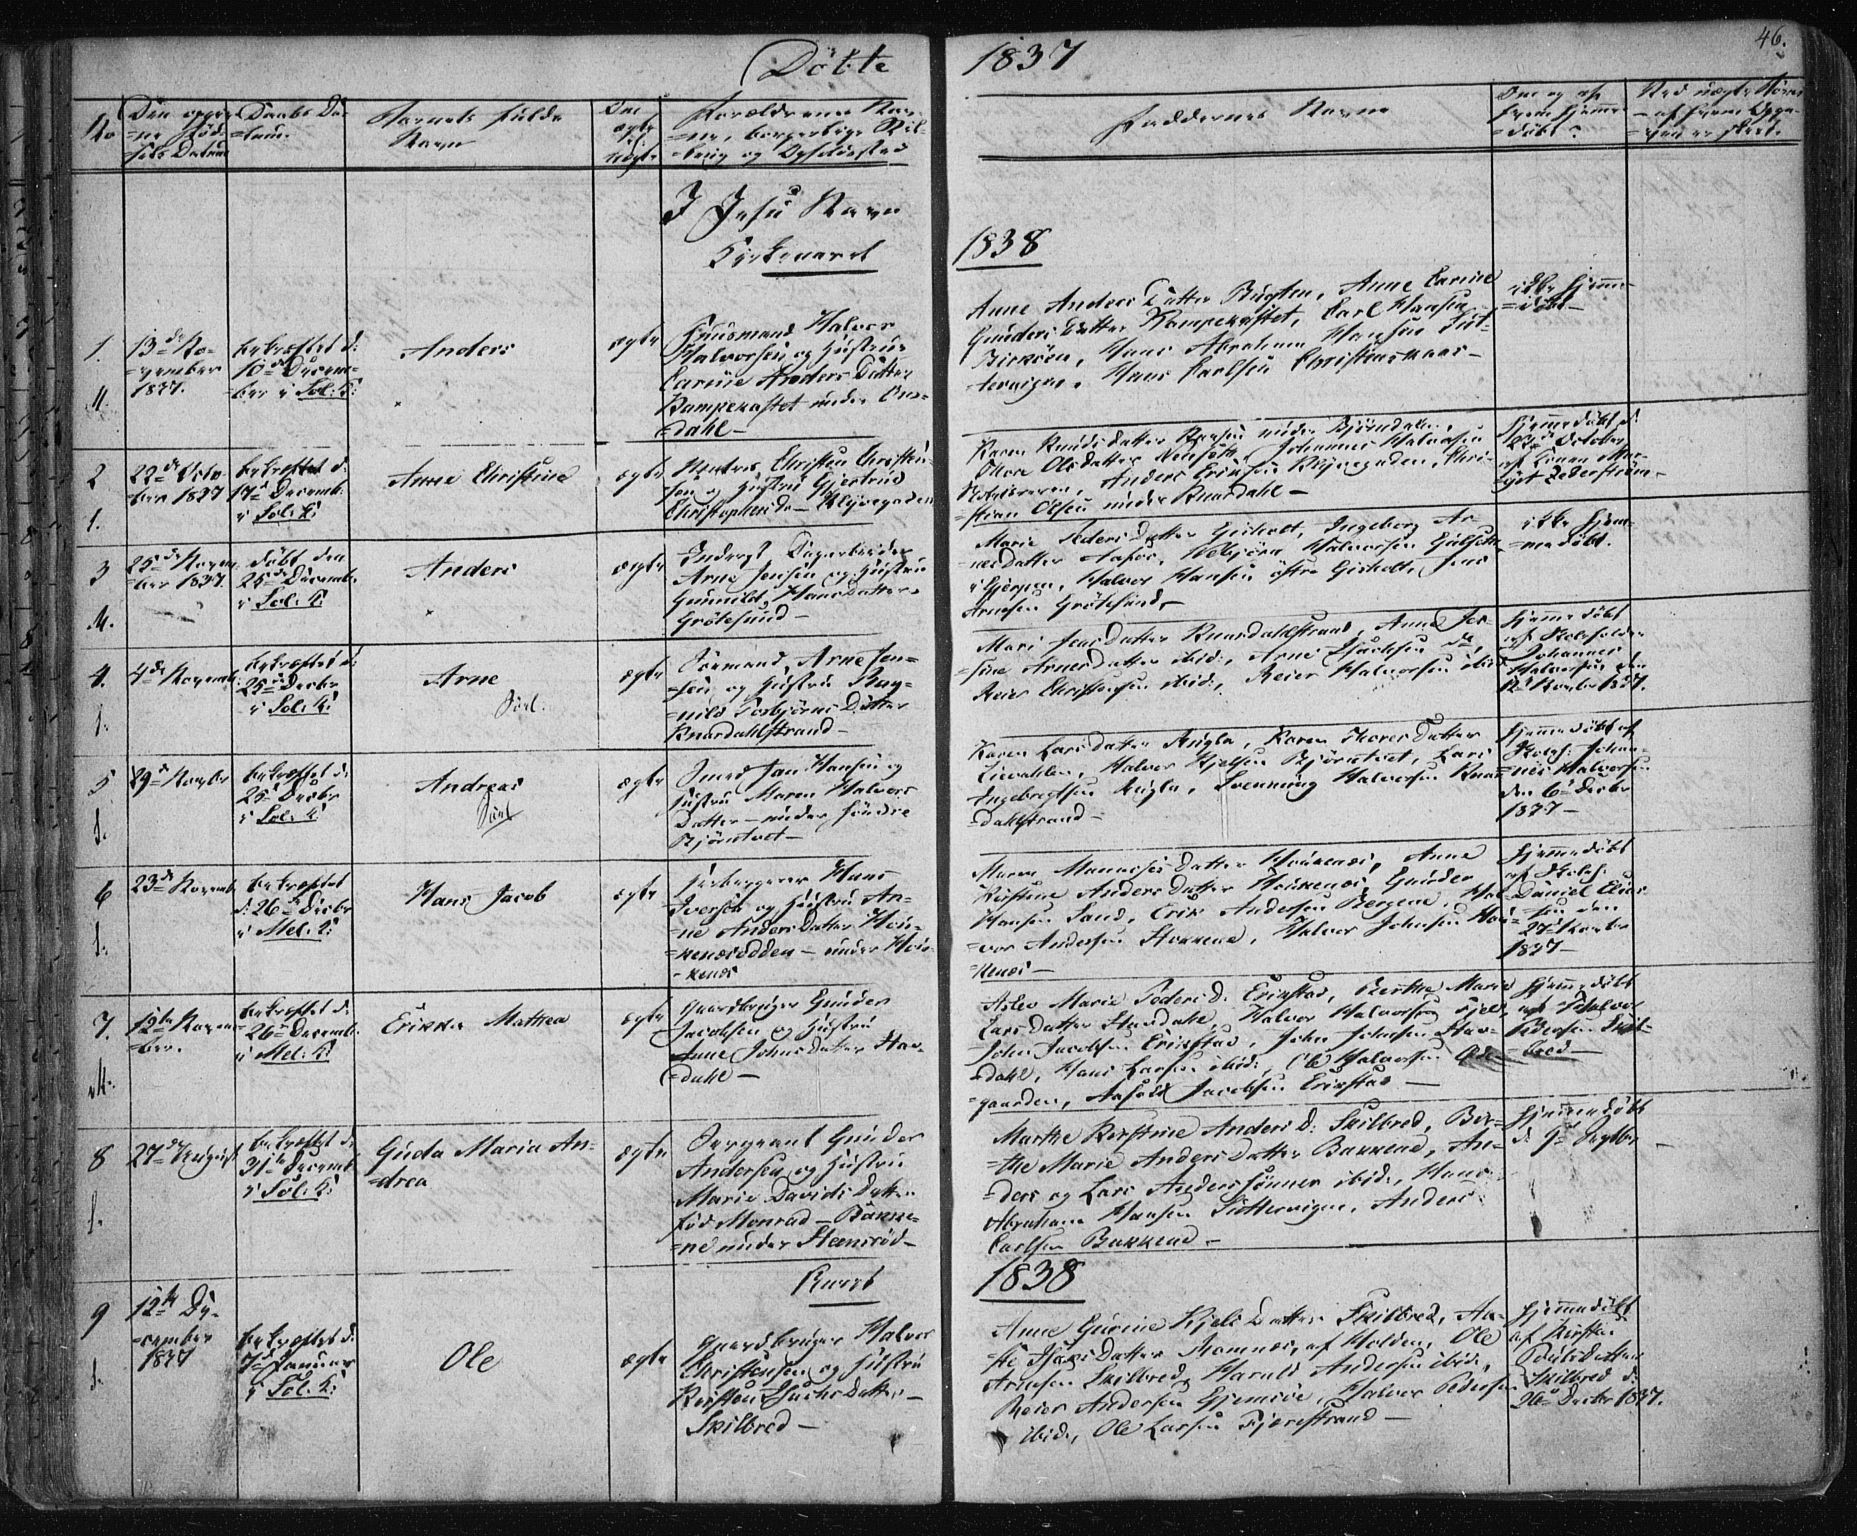 SAKO, Solum kirkebøker, F/Fa/L0005: Ministerialbok nr. I 5, 1833-1843, s. 46